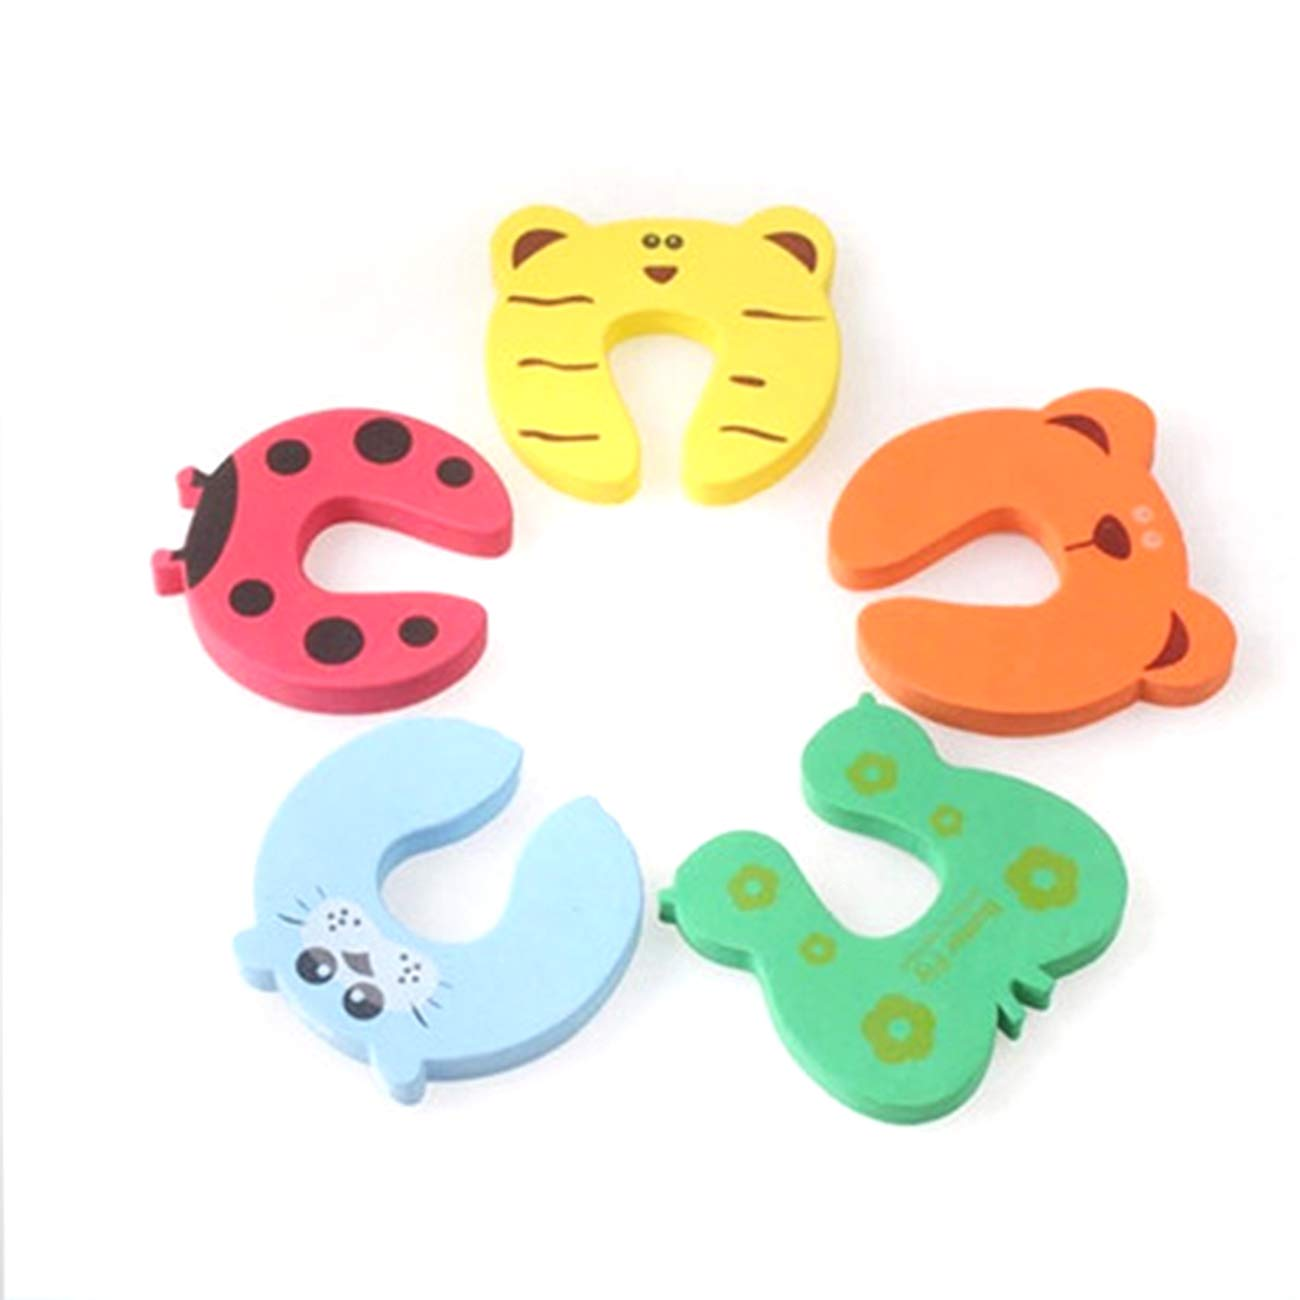 uxcell 5 Pcs Children Safety Finger Pinch Cartoon Animal Foam Door Stopper Cushion